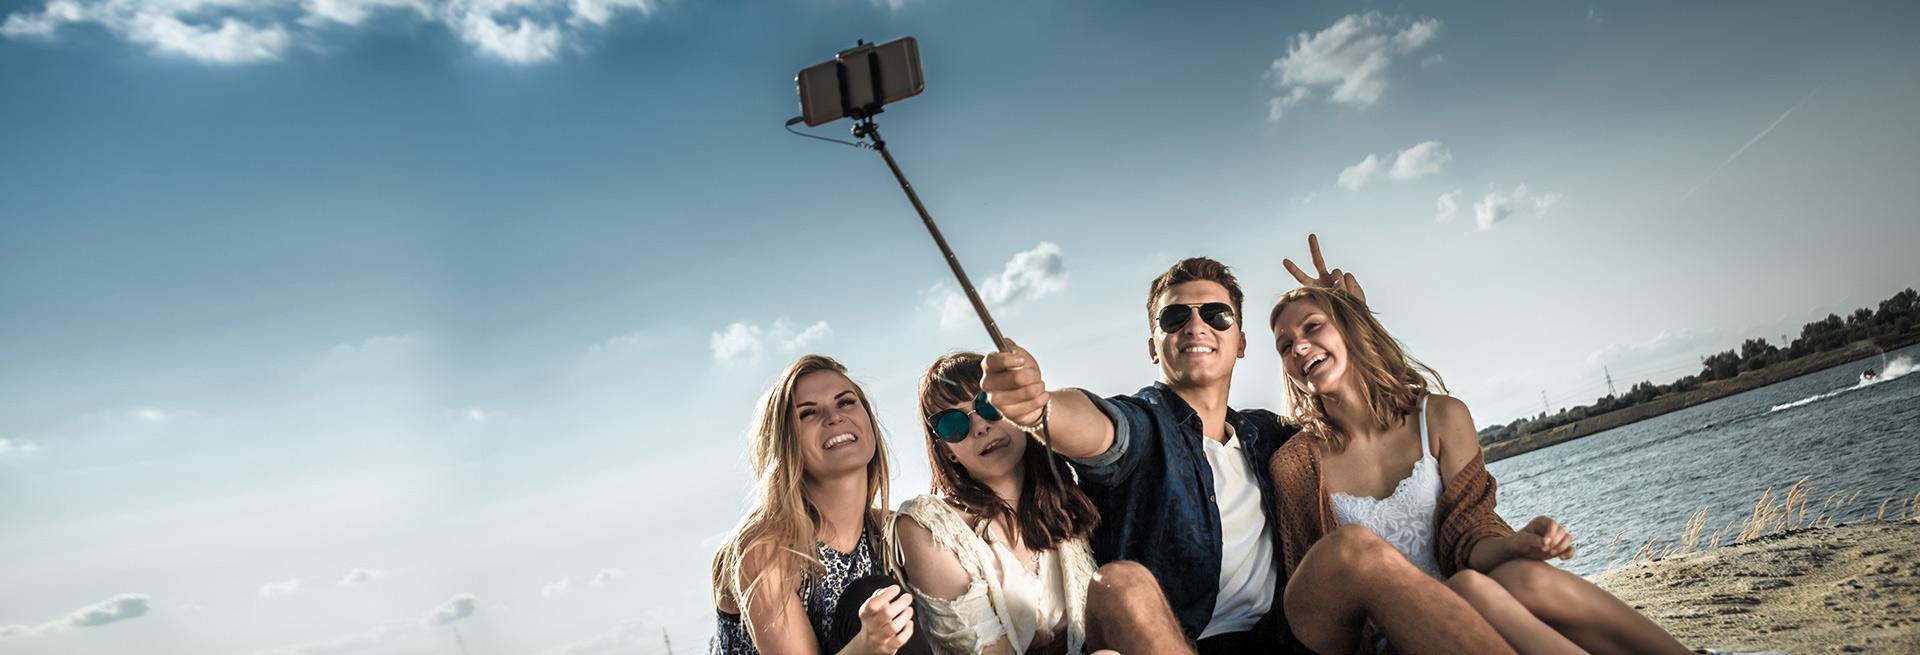 MEIZU Kijek do selfie